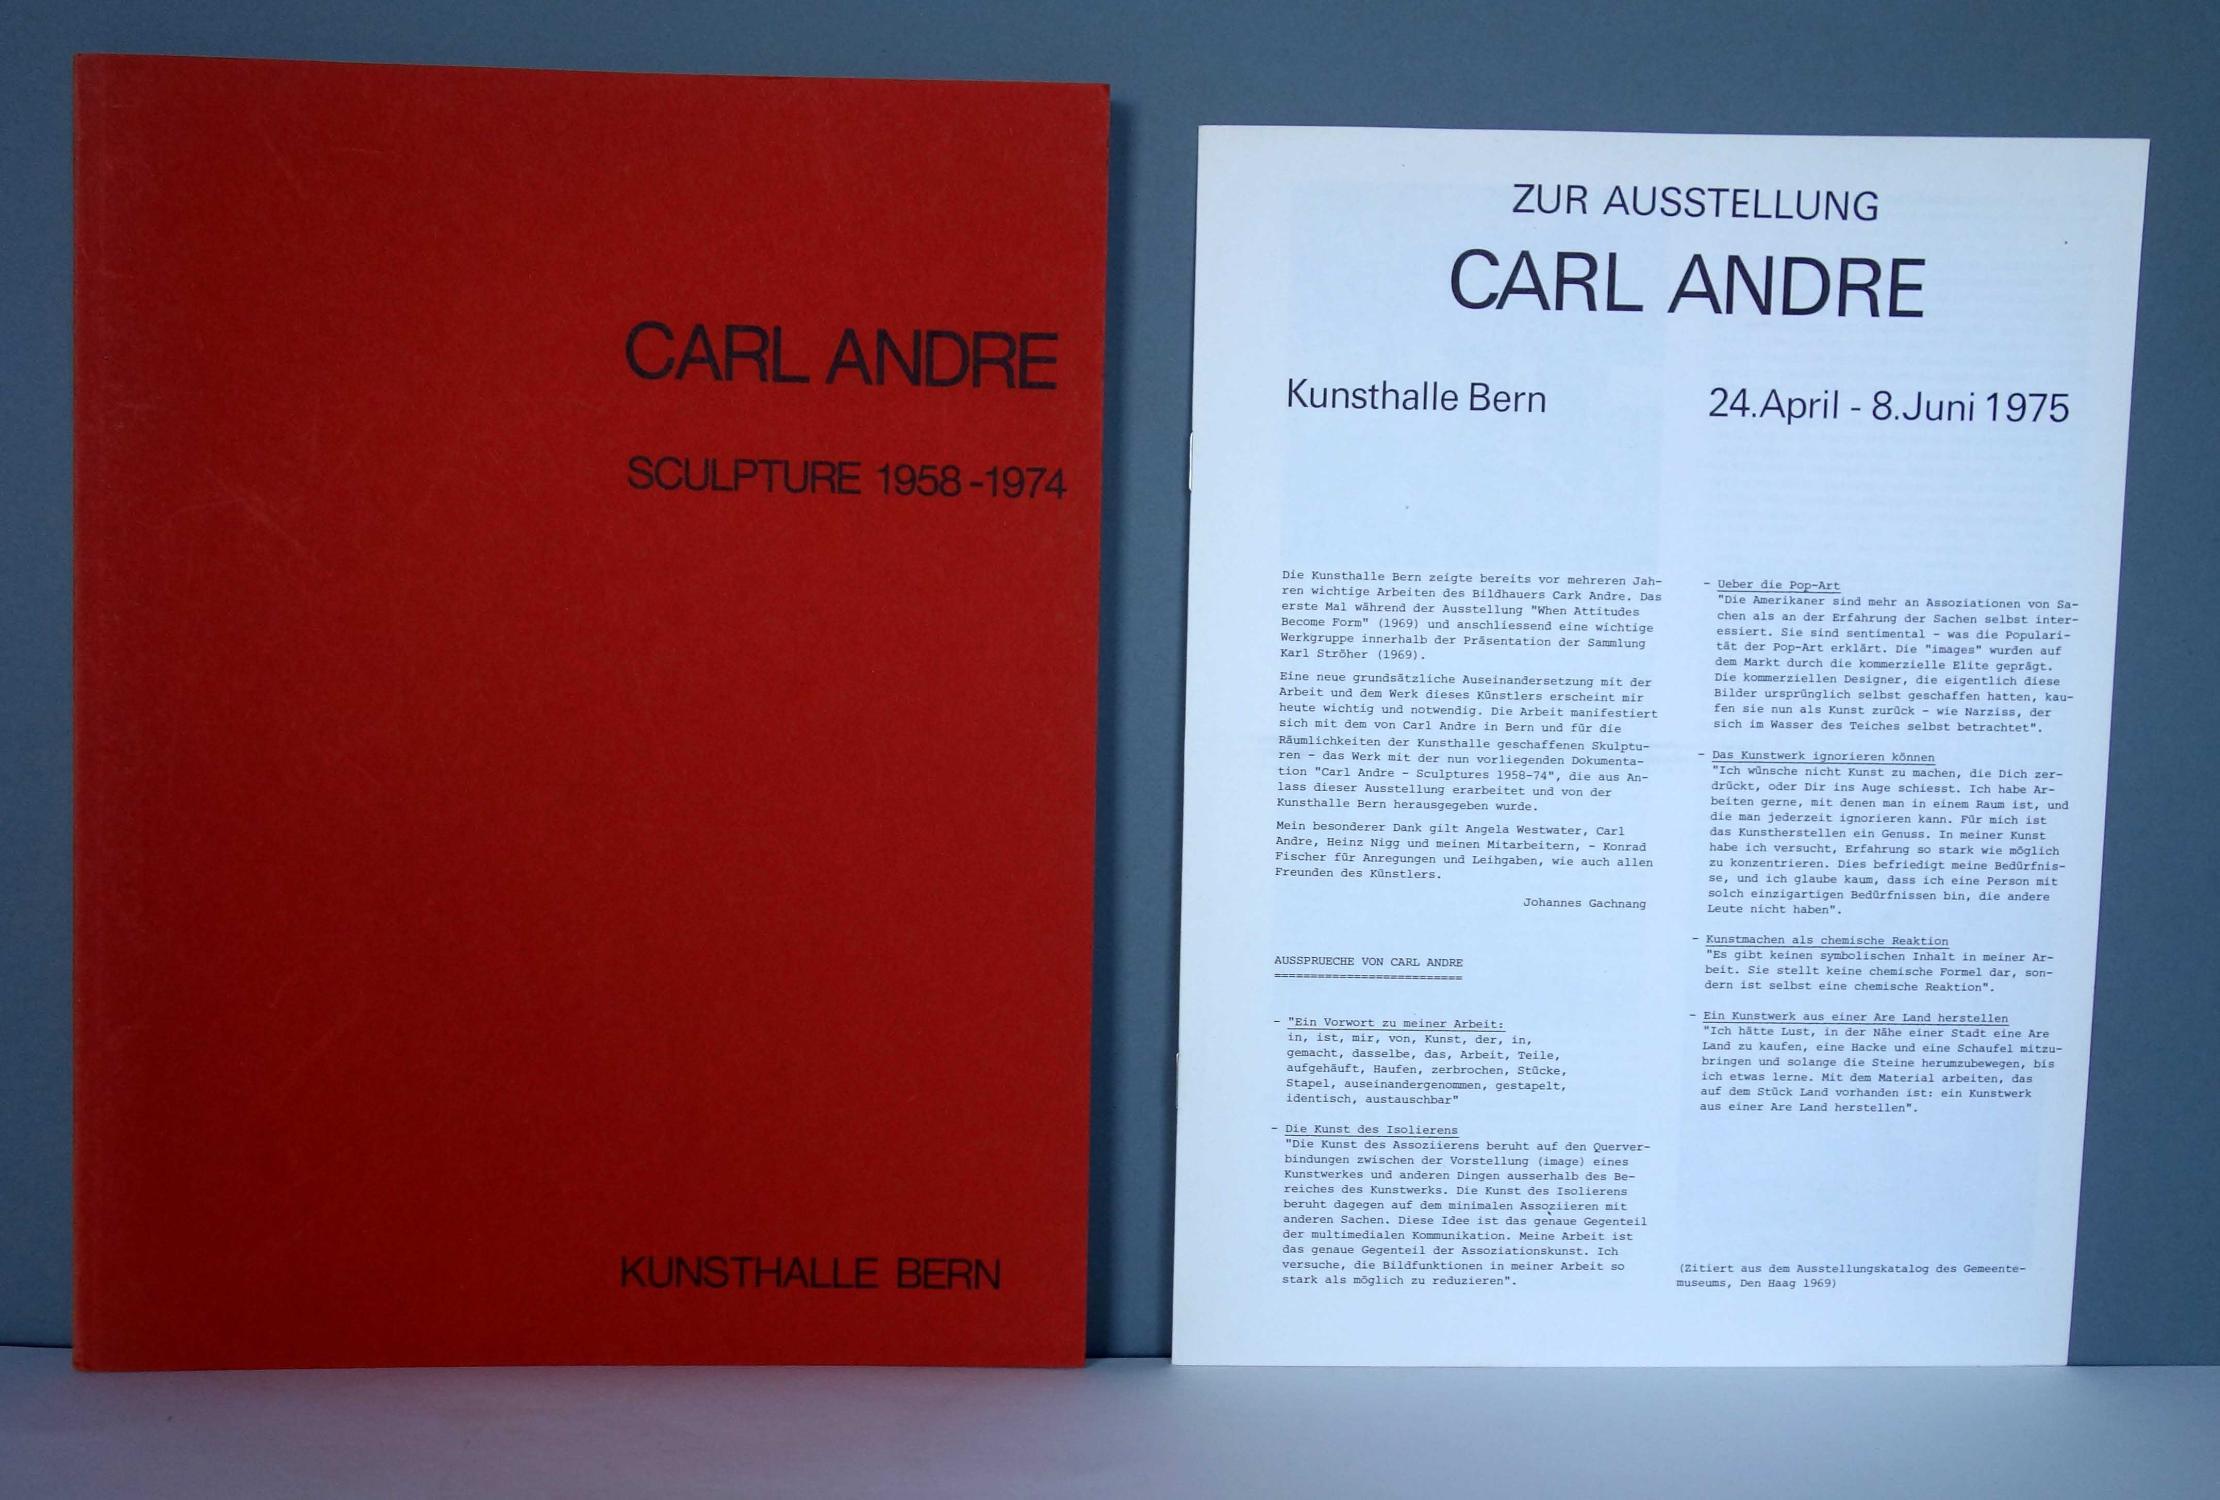 Sculpture 1958 - 1974.: Carl Andre